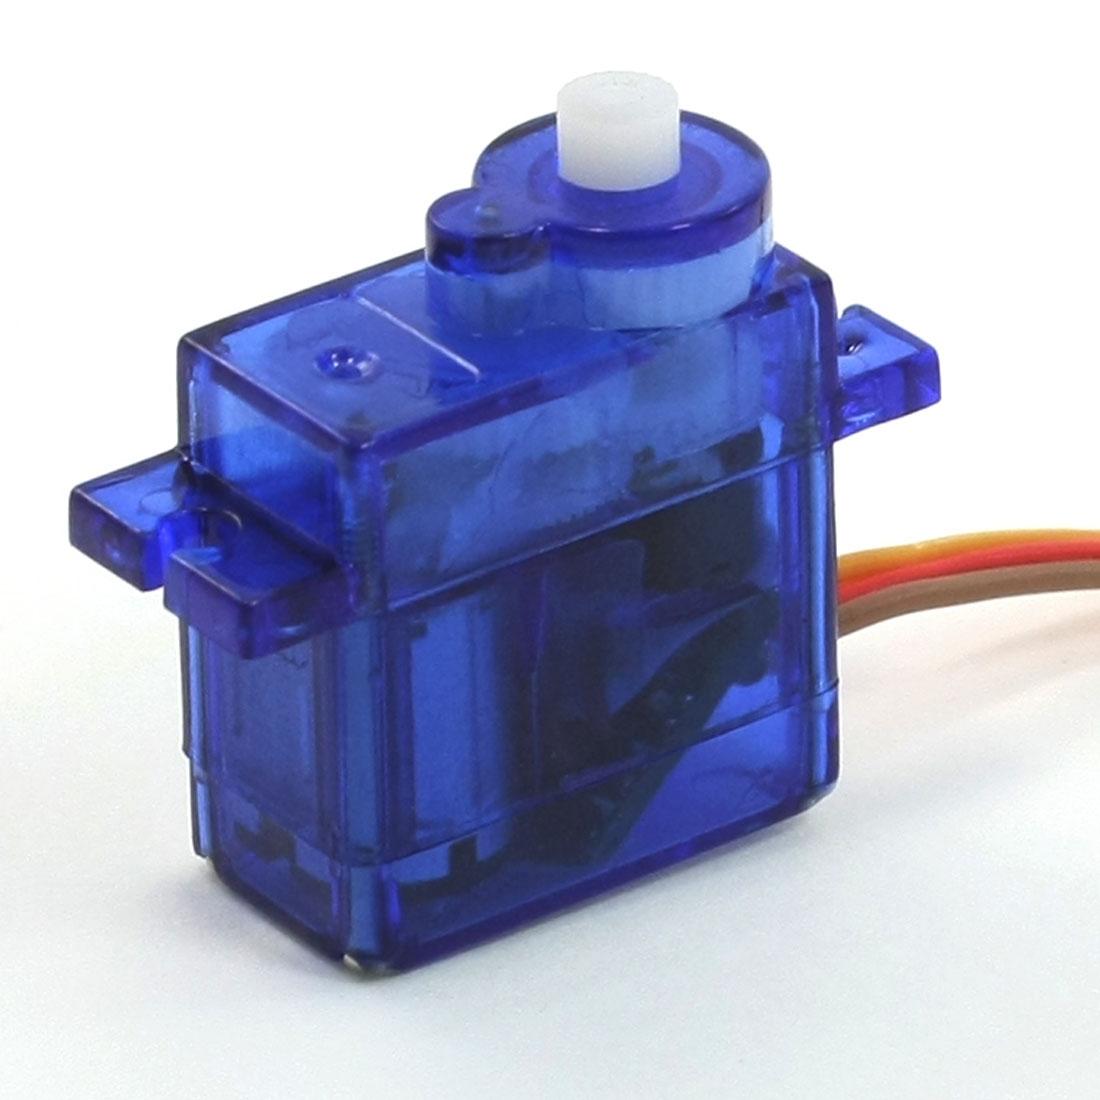 Blue Insulation Housing Mini 9G Servo Motor for RC Robot Holicopter Futaba Hitec